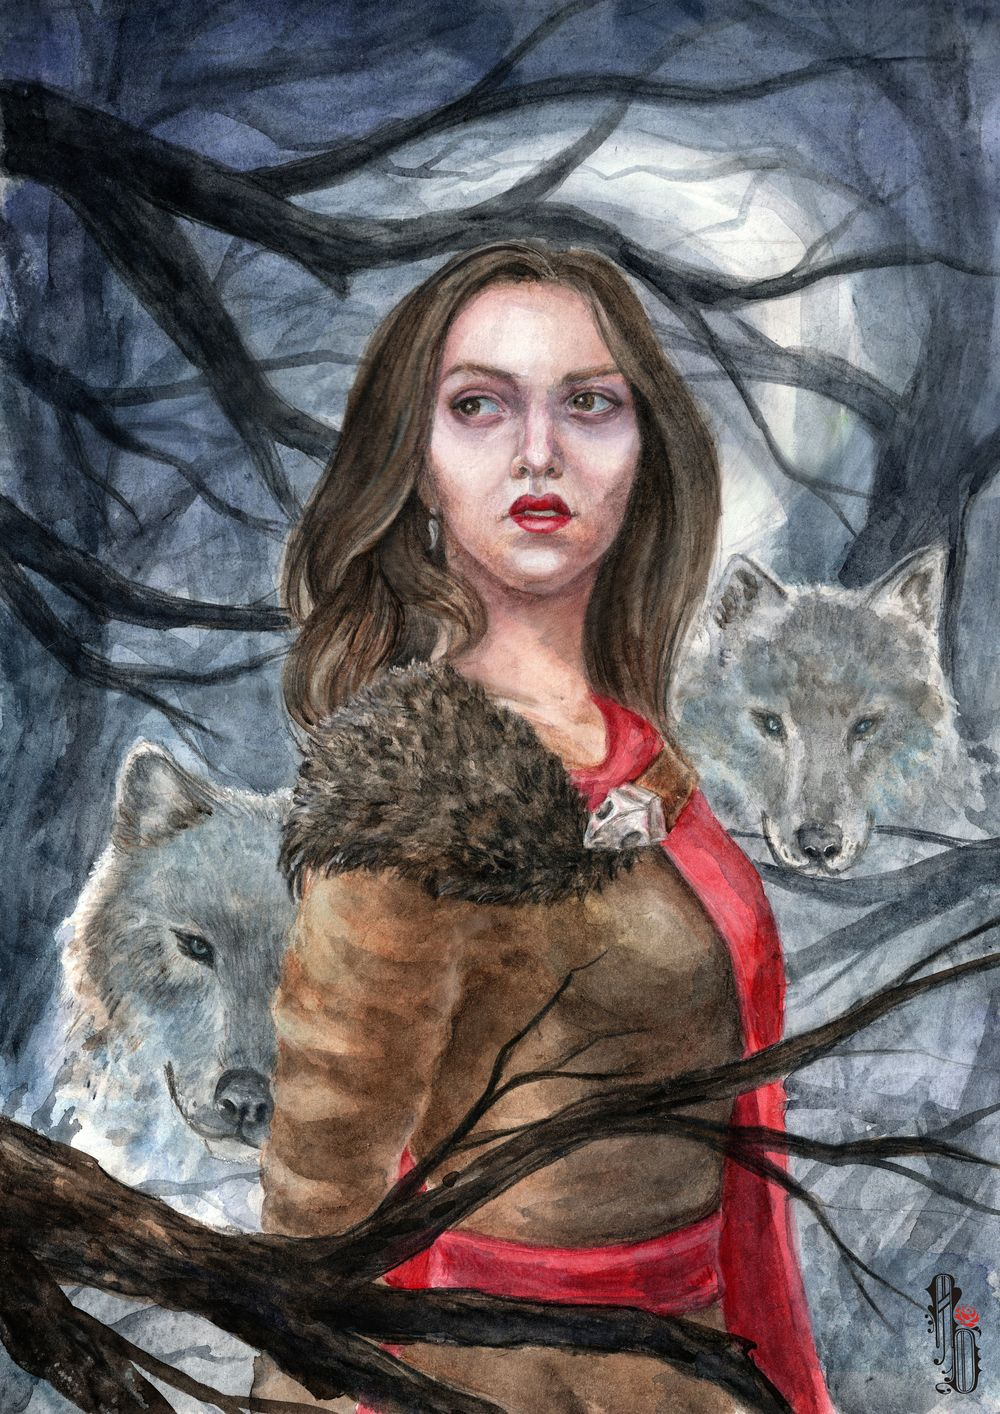 Dark forest story by AlbinaDiamond